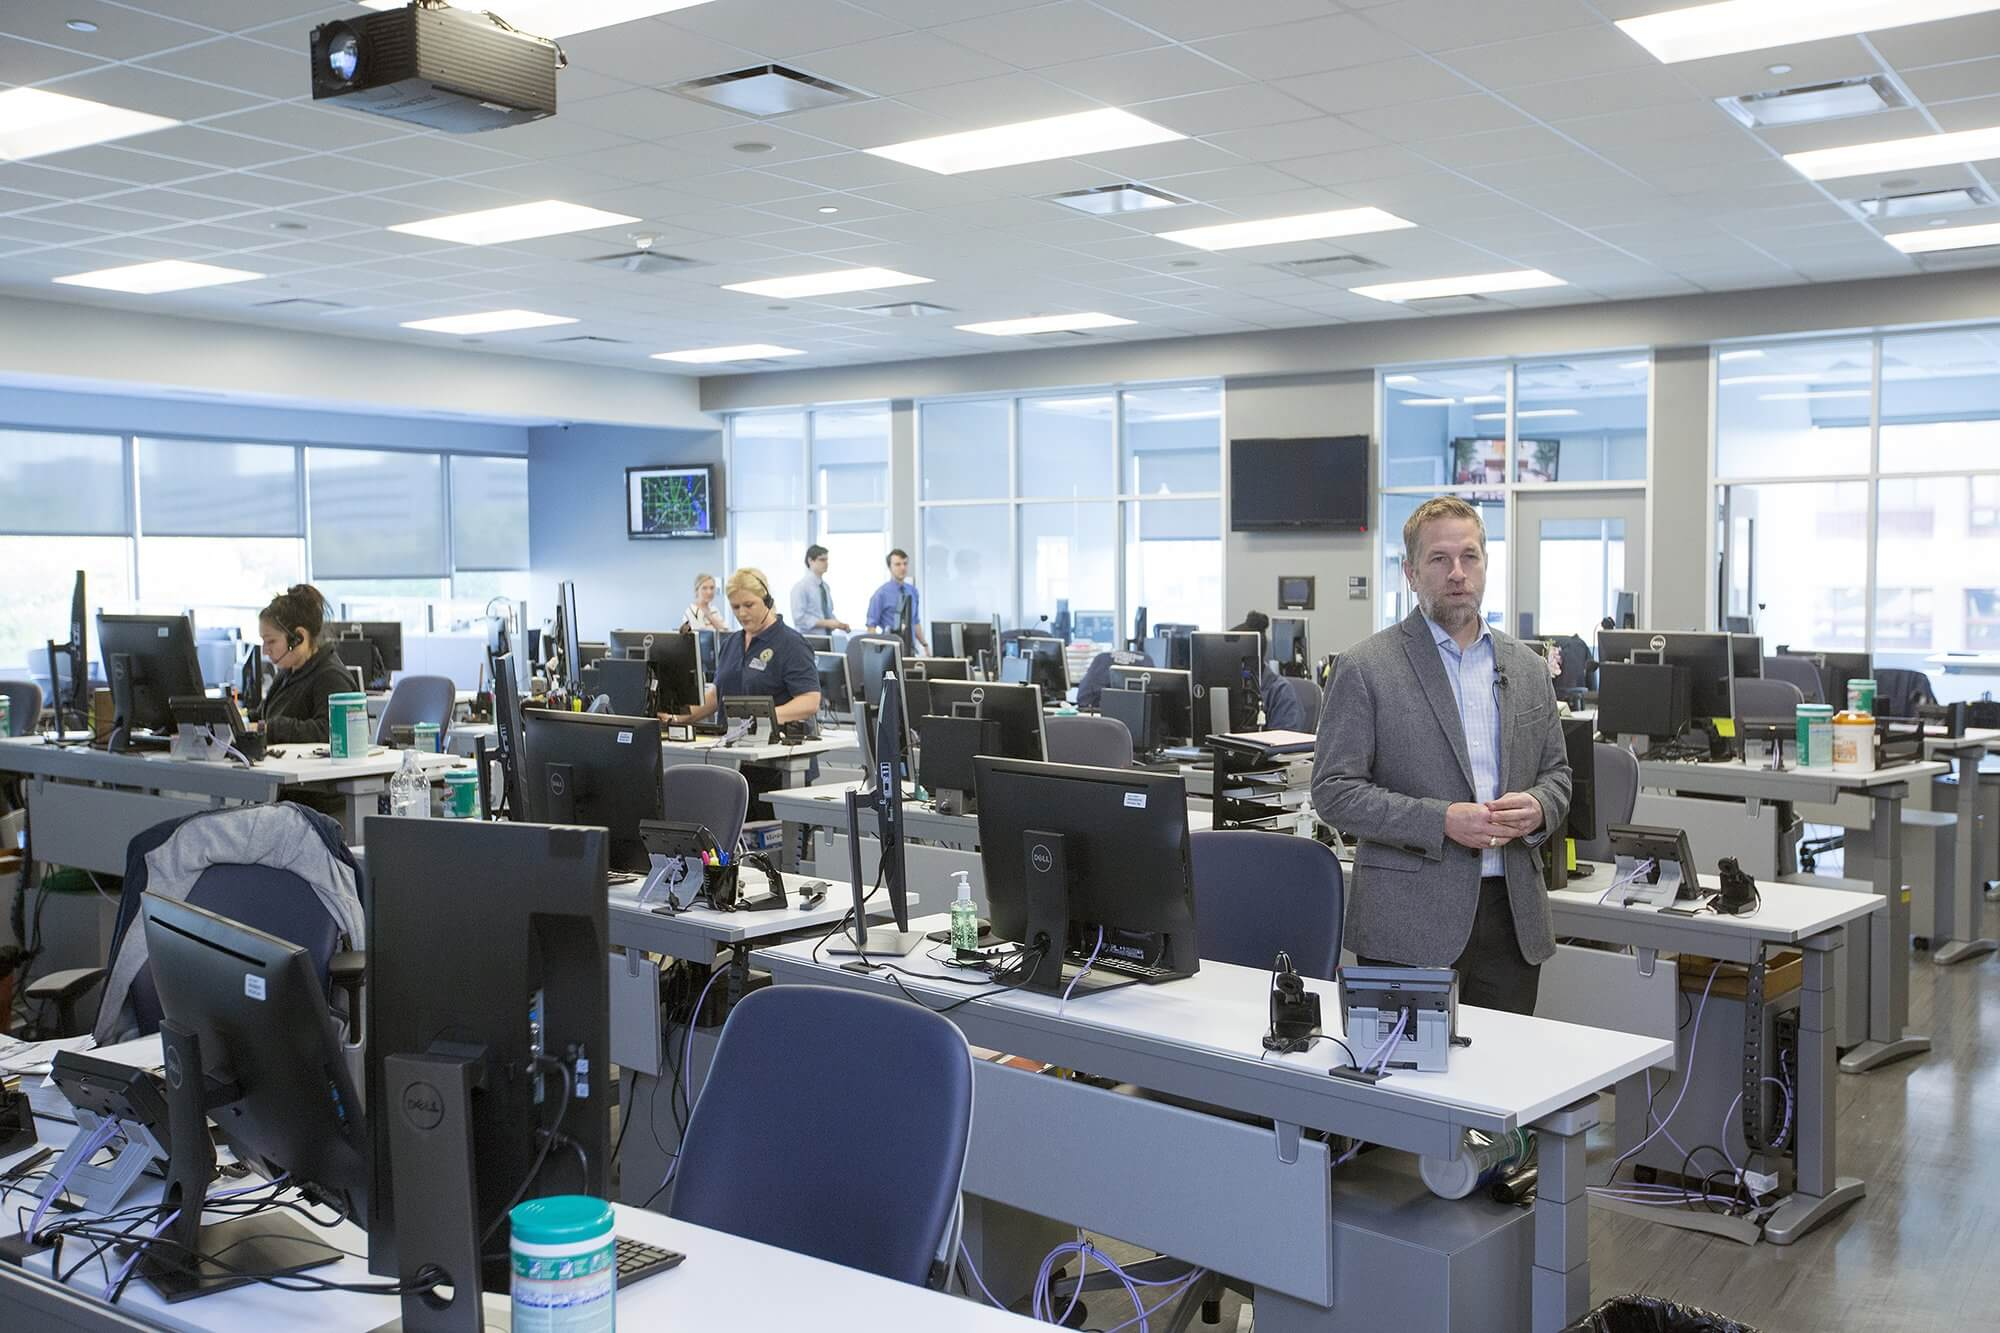 A Sneak Peek Inside Harris County Institute Of Forensic Sciences New Building Tmc News